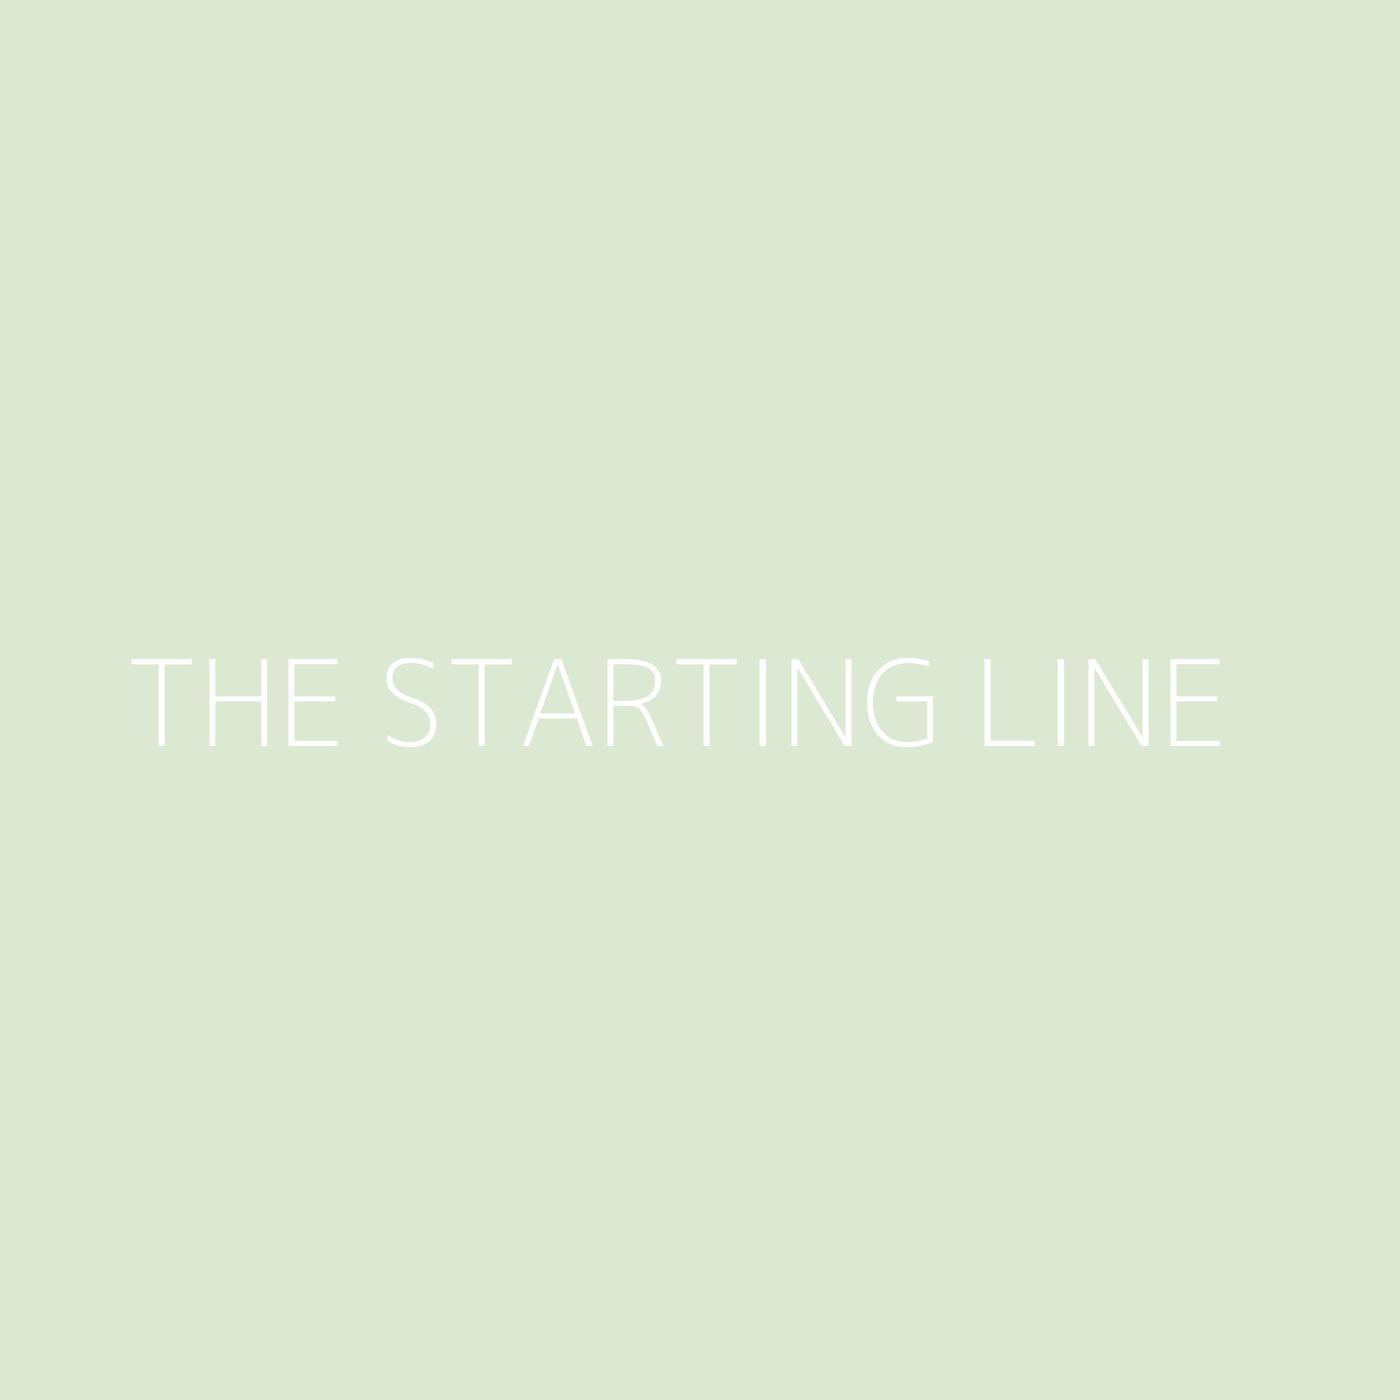 The Starting Line Playlist Artwork